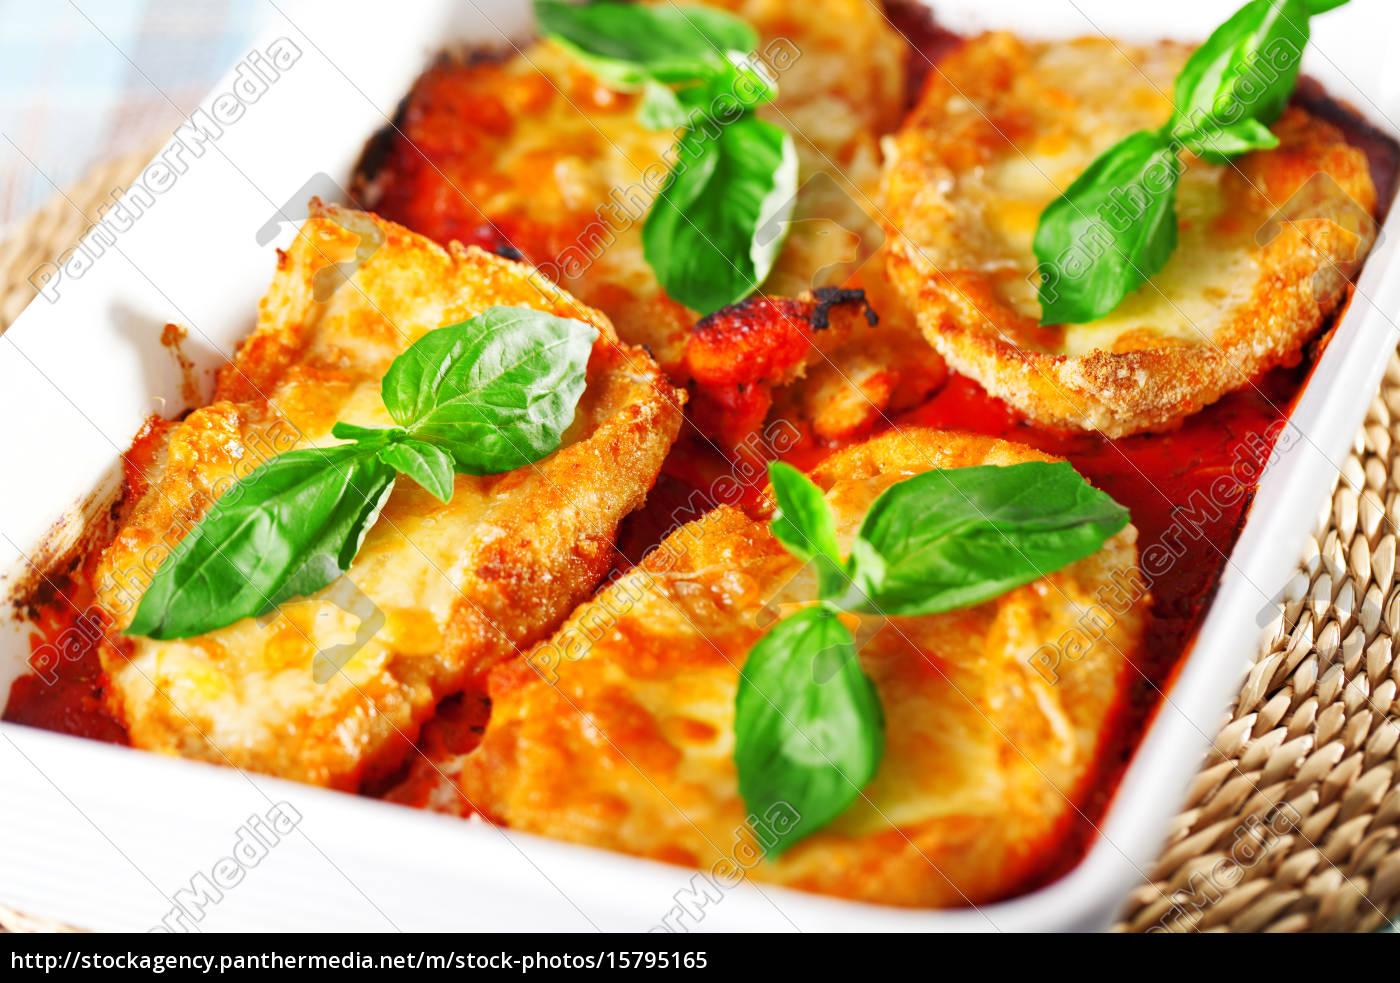 schnitzels, schnitzels, schnitzels, schnitzels - 15795165